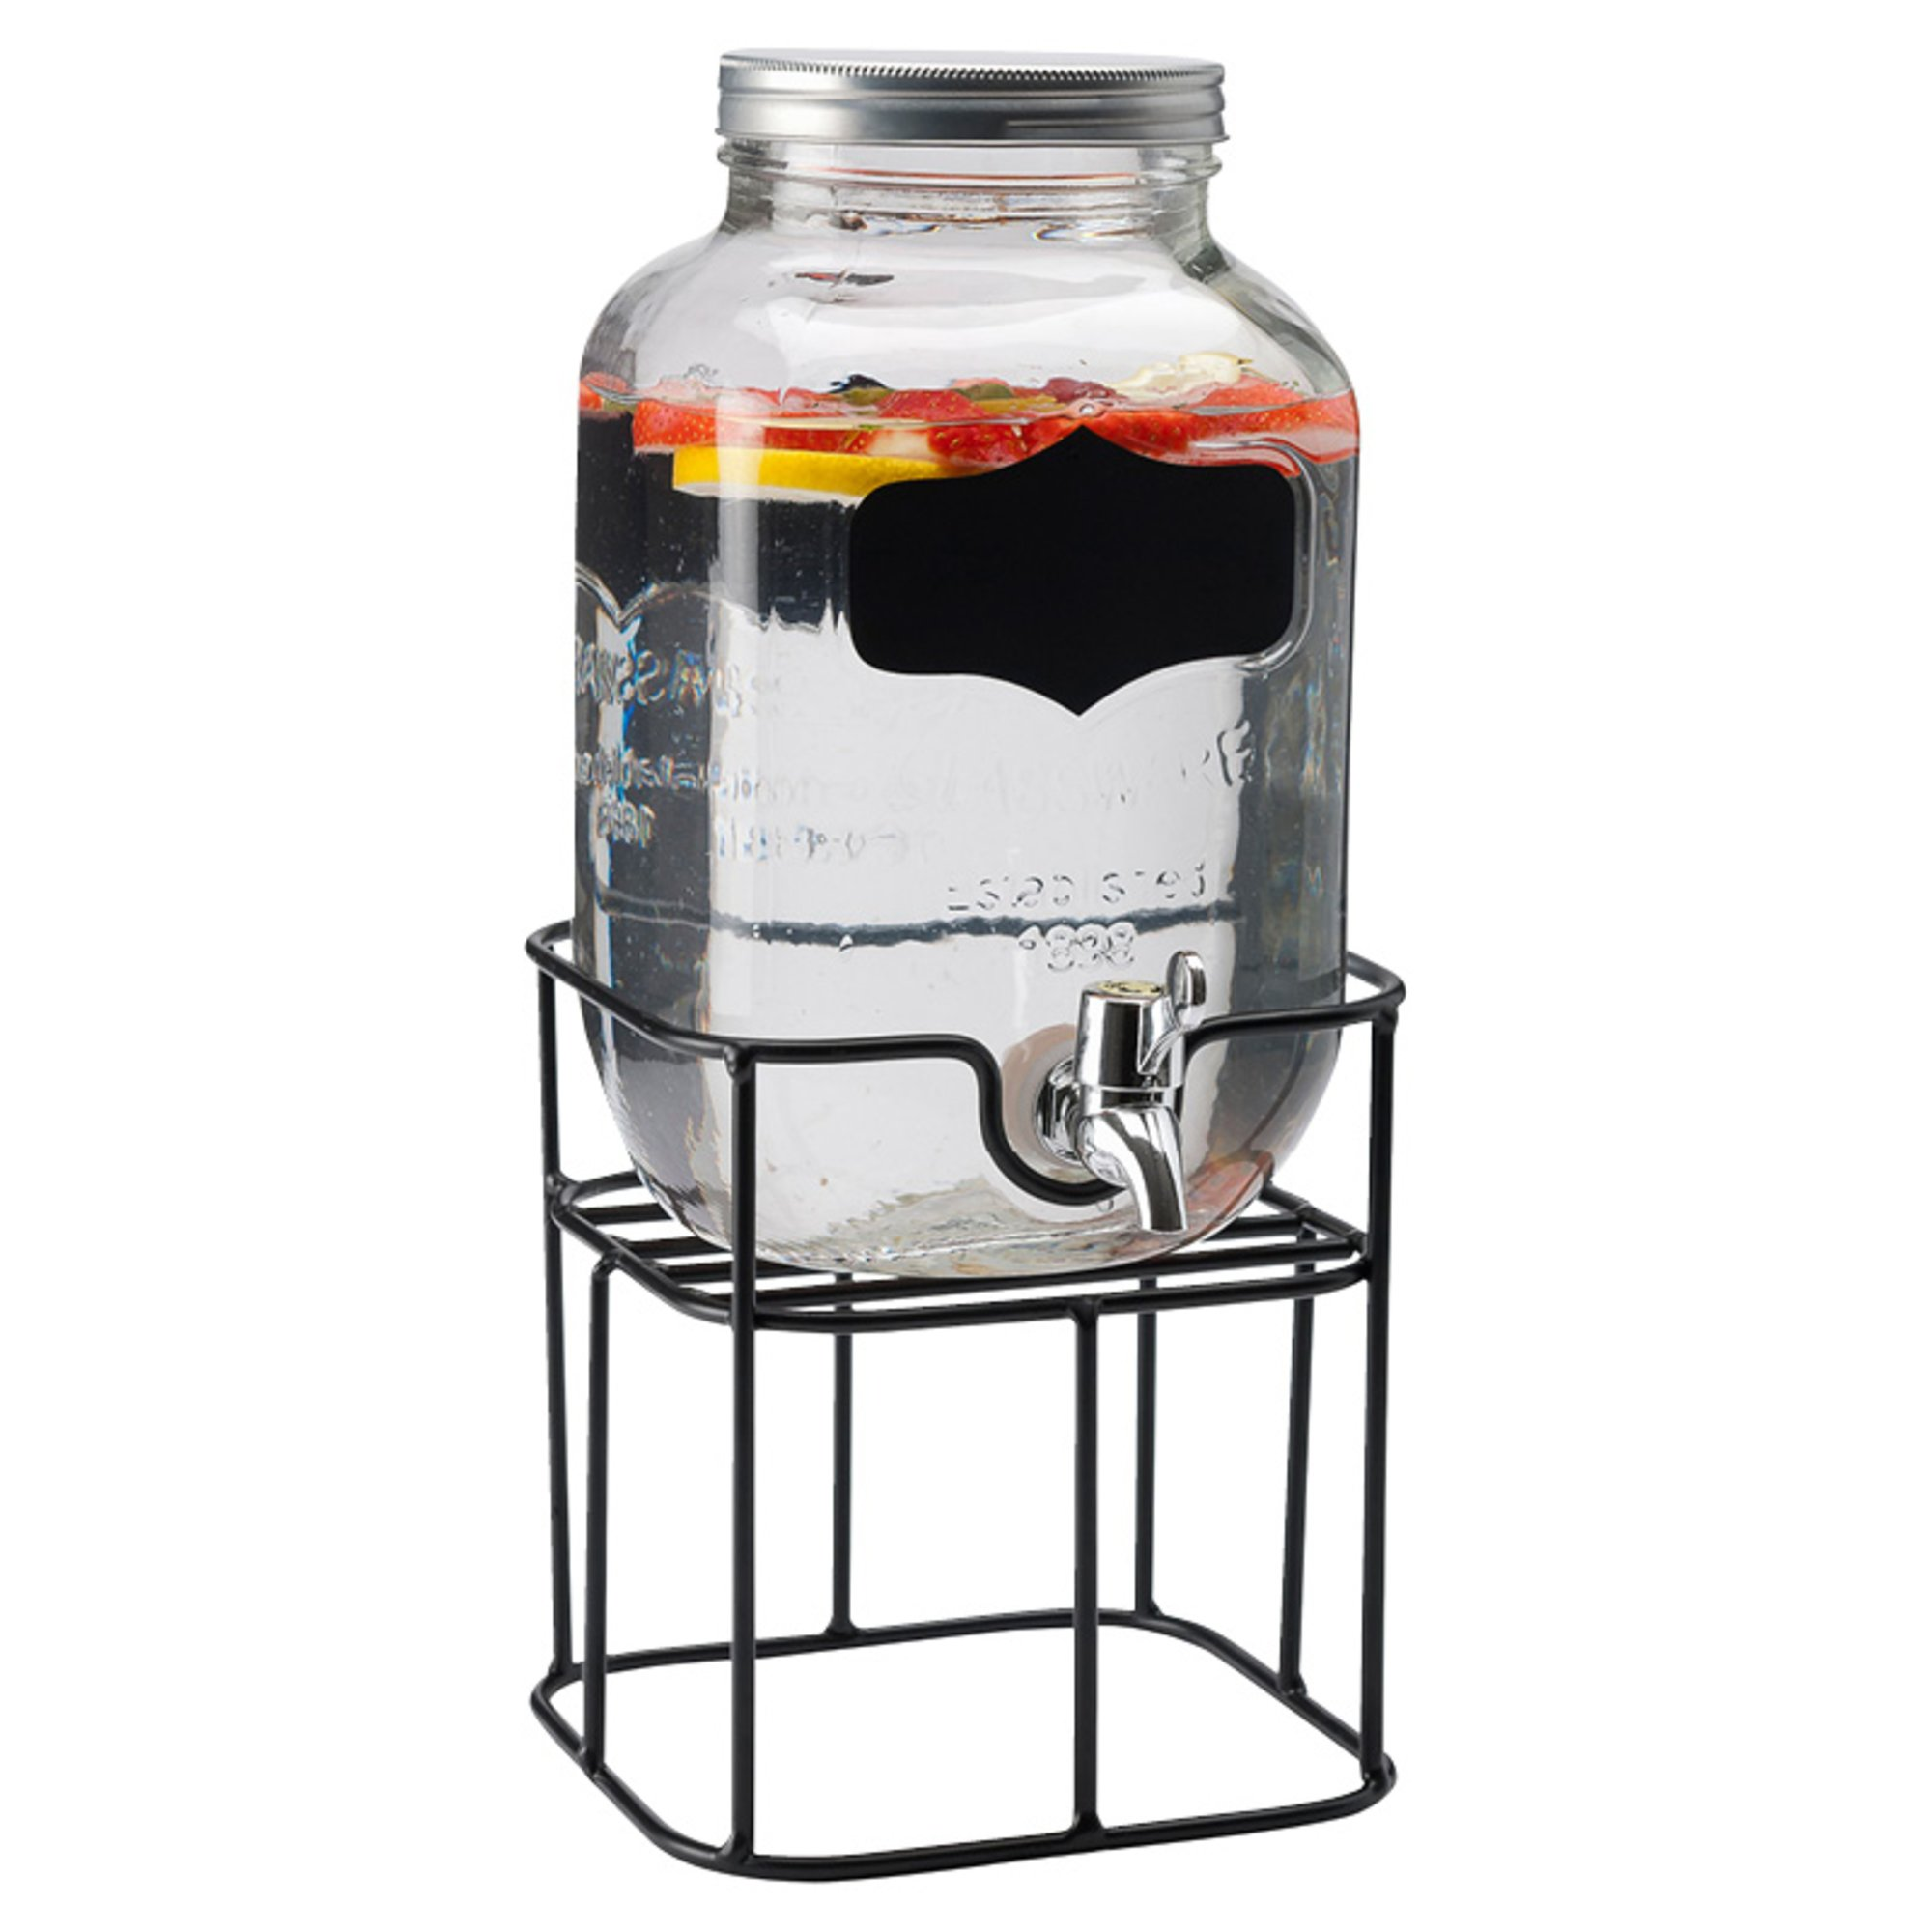 Dorre Jumbo Glasbehållare med tappkran